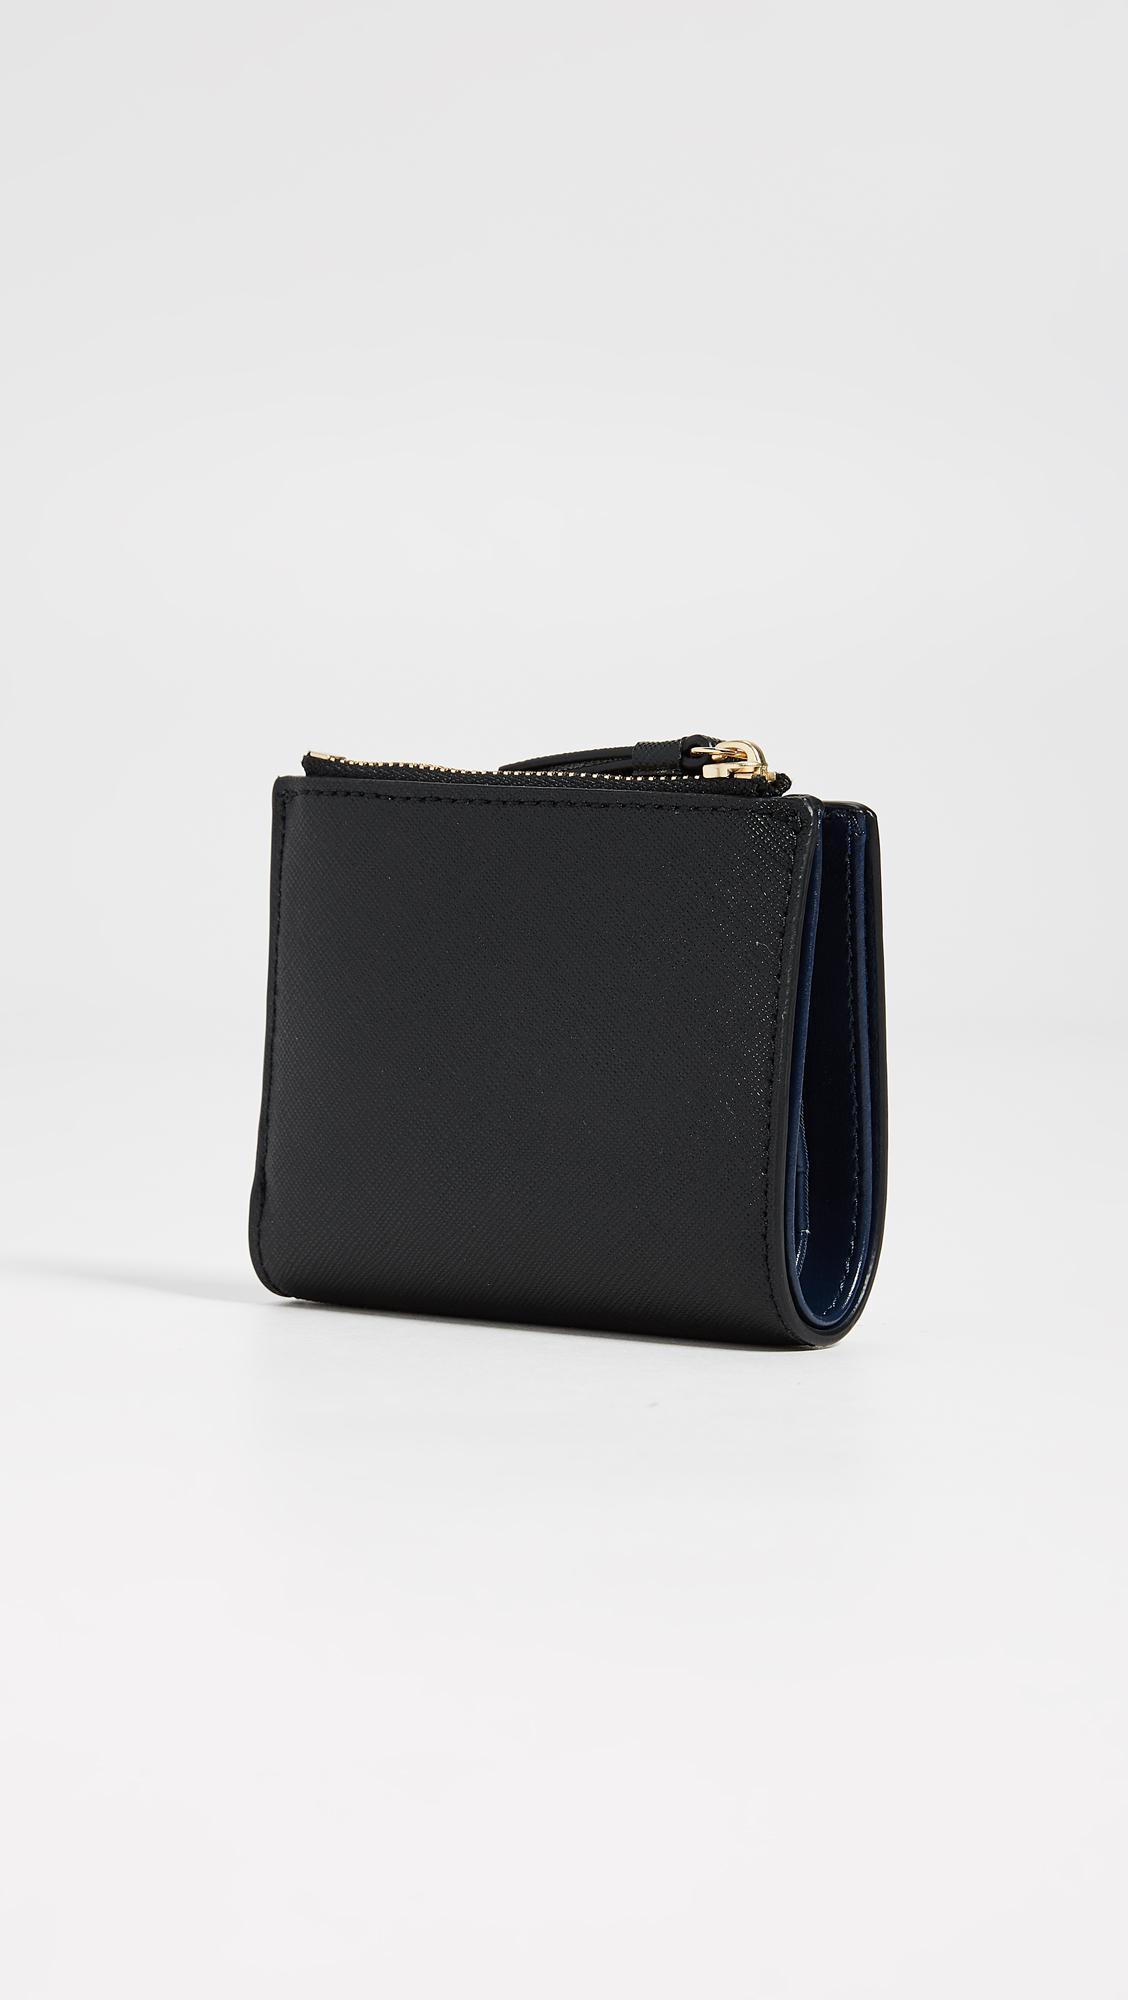 797d27e722a3 Tory Burch - Black Robinson Mini Wallet - Lyst. View fullscreen